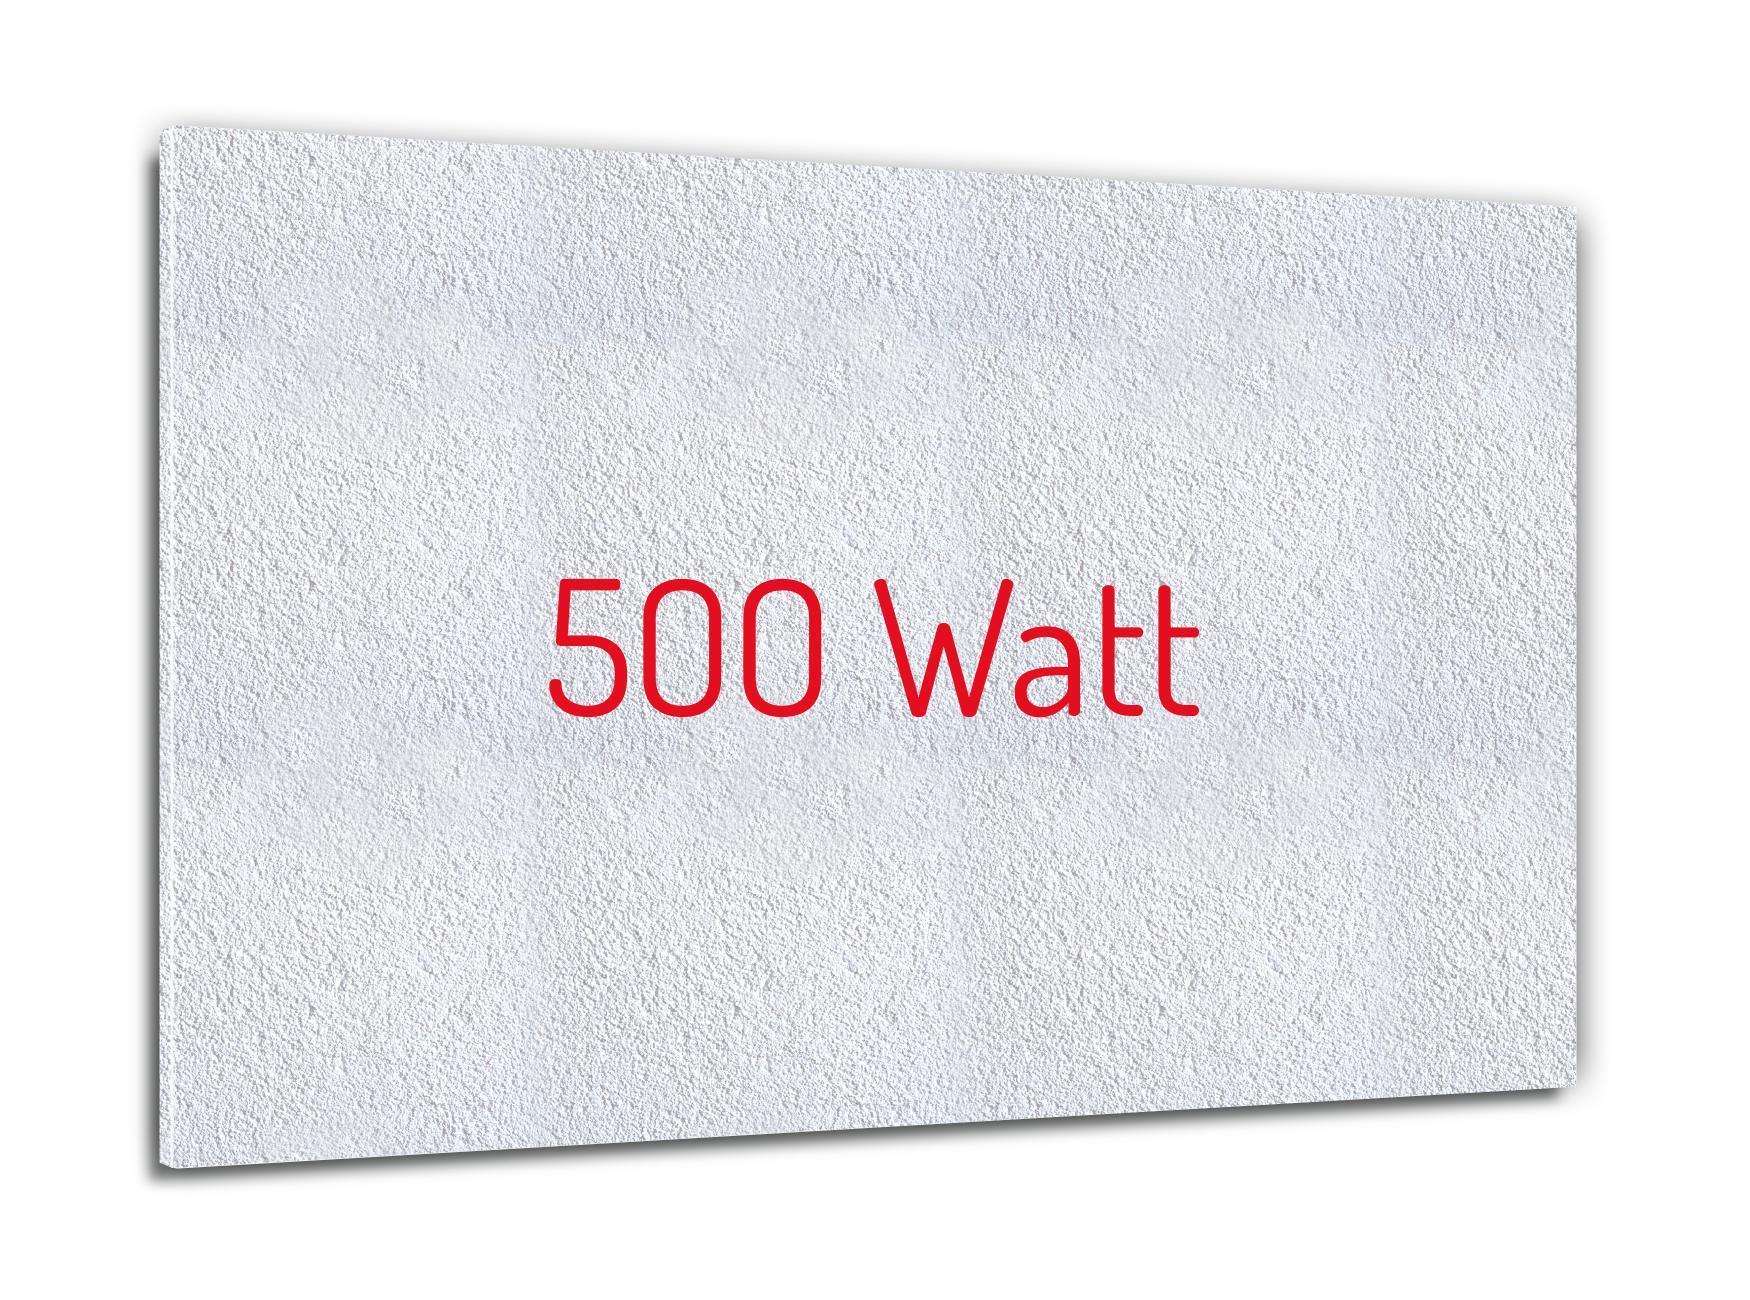 PowerSun NewLine 500 Watt 60x90cm Mineralisiert